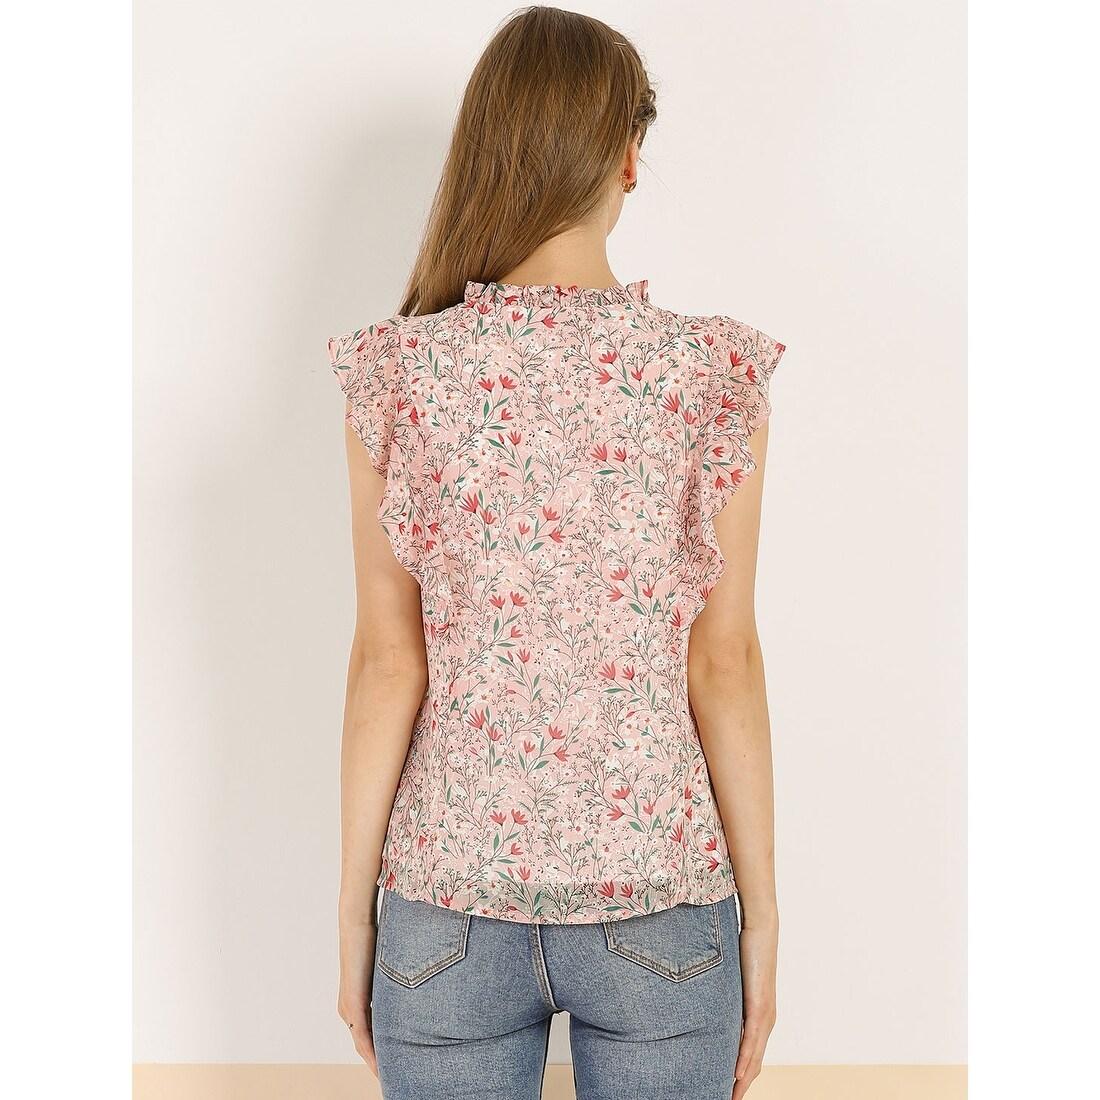 Handmade Top Ruffle Blouse V-neck Top 9-9 Blouse Pink Daisy Ruffle Top